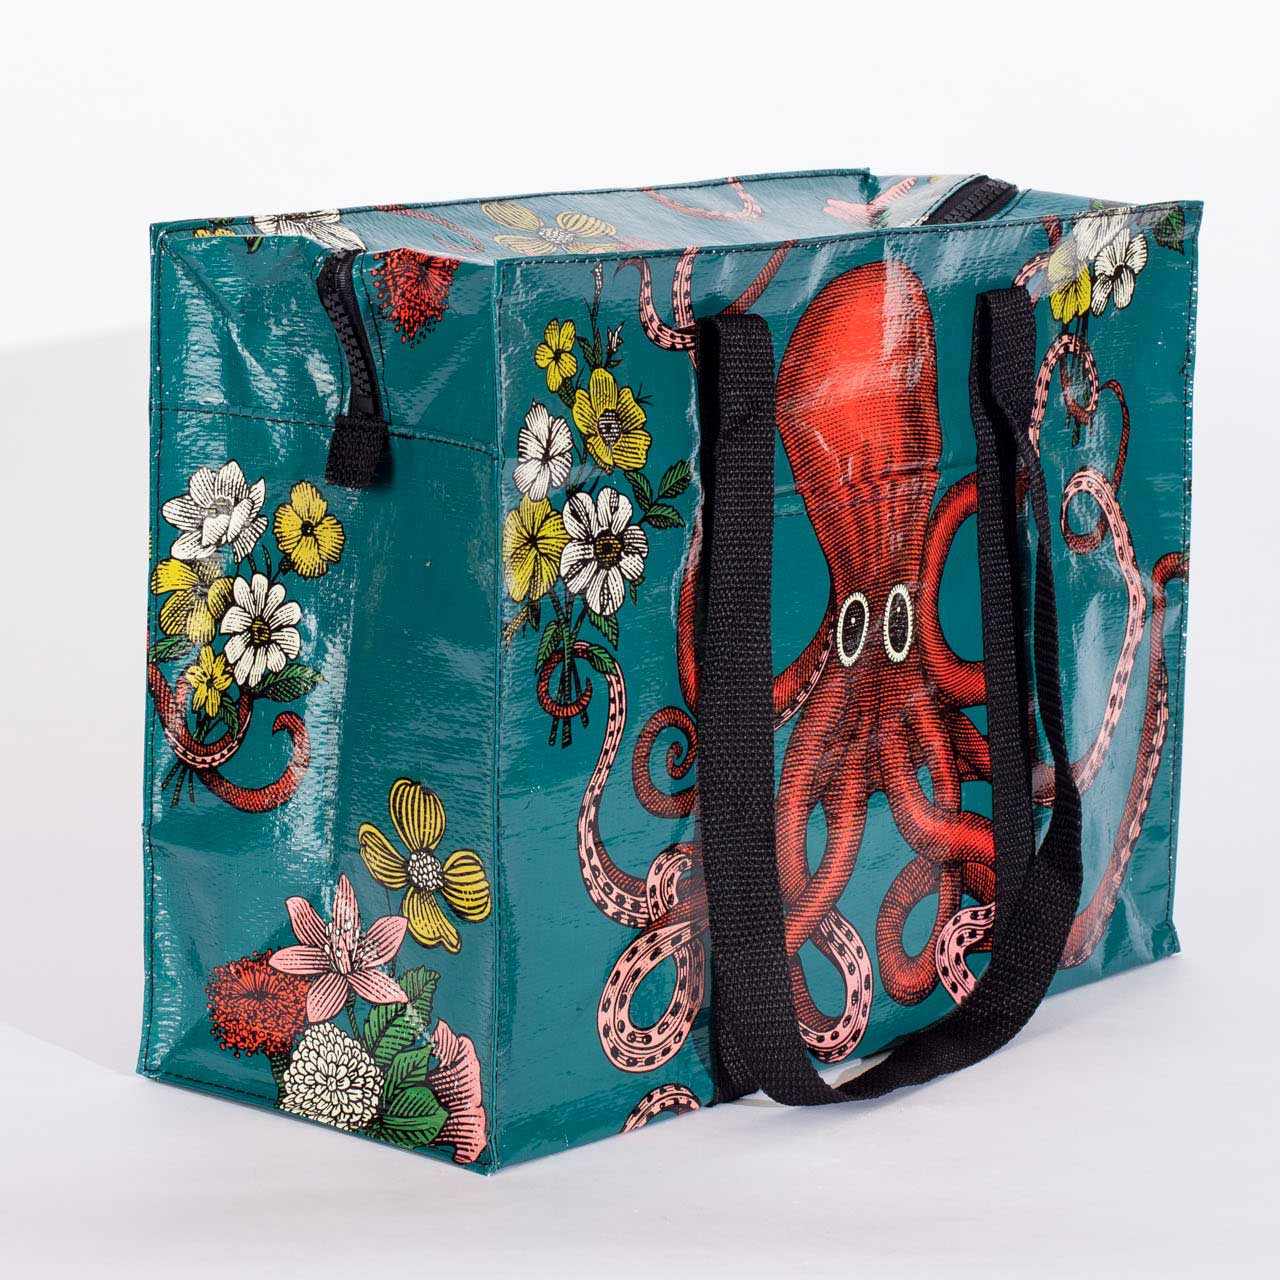 Octopus Shoulder Tote by Blue Q  | the design gift shop